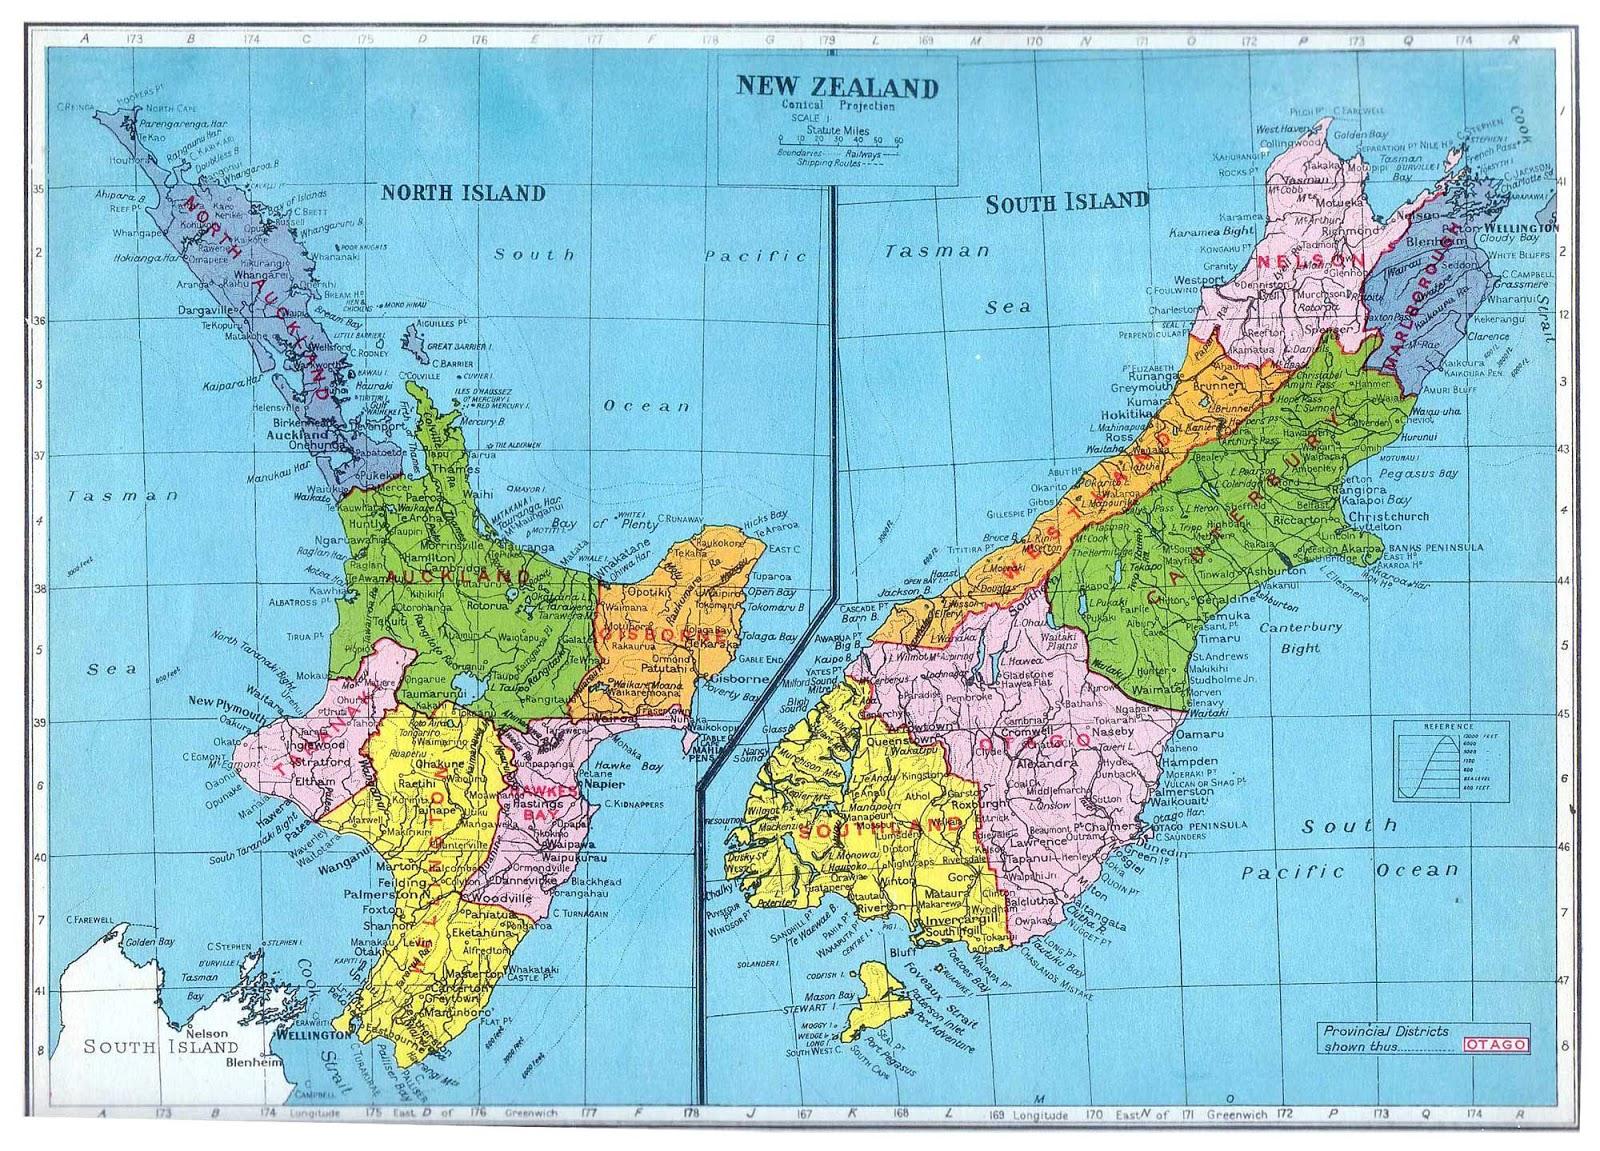 Literatura neozelandesa